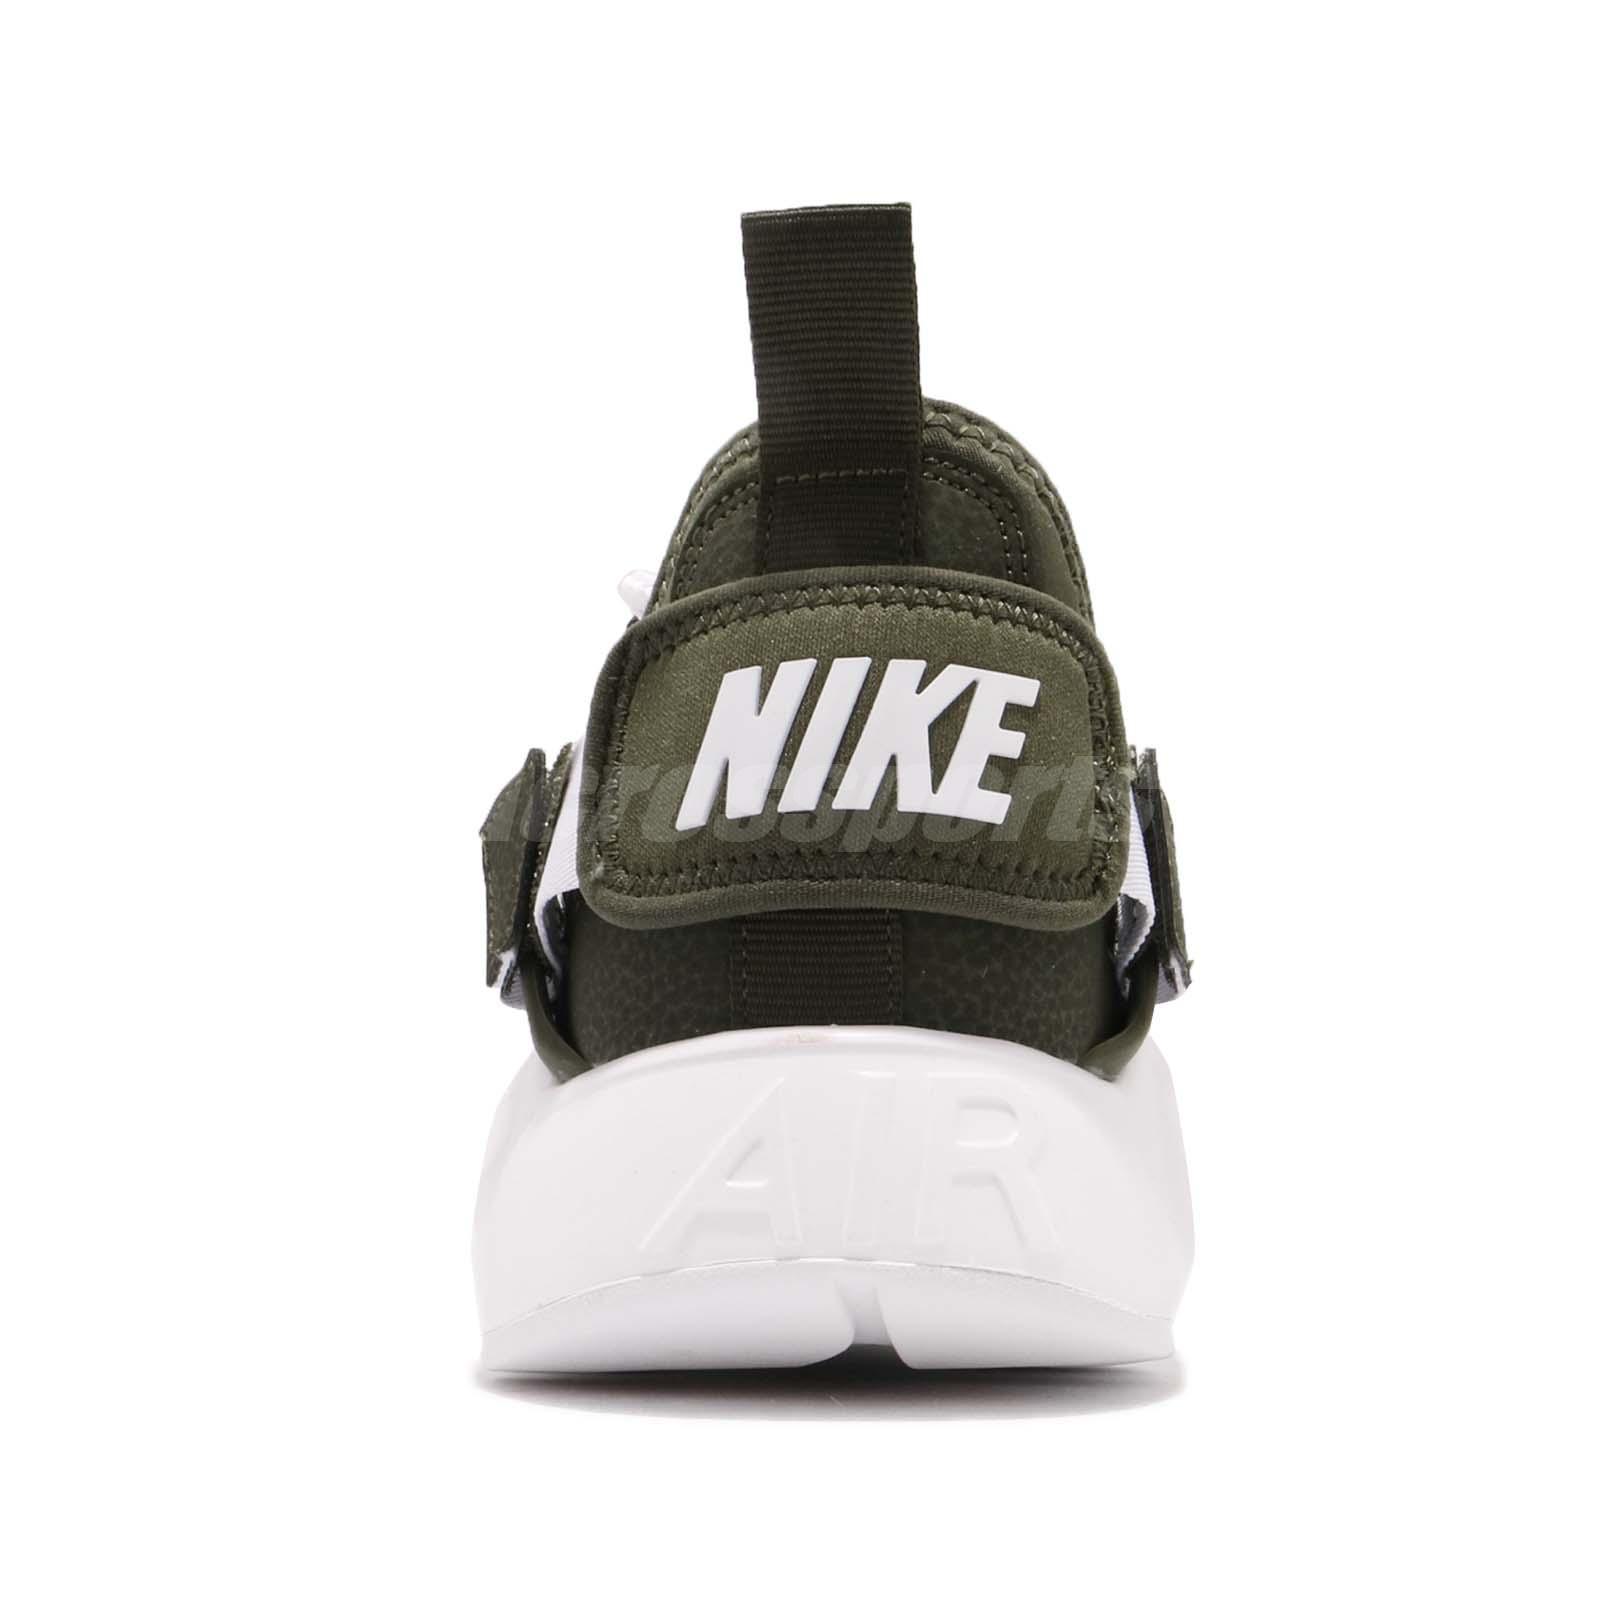 f1ca2d67076f3 Nike W Air Huarache City Low Cargo Khaki Green White Women Shoes ...